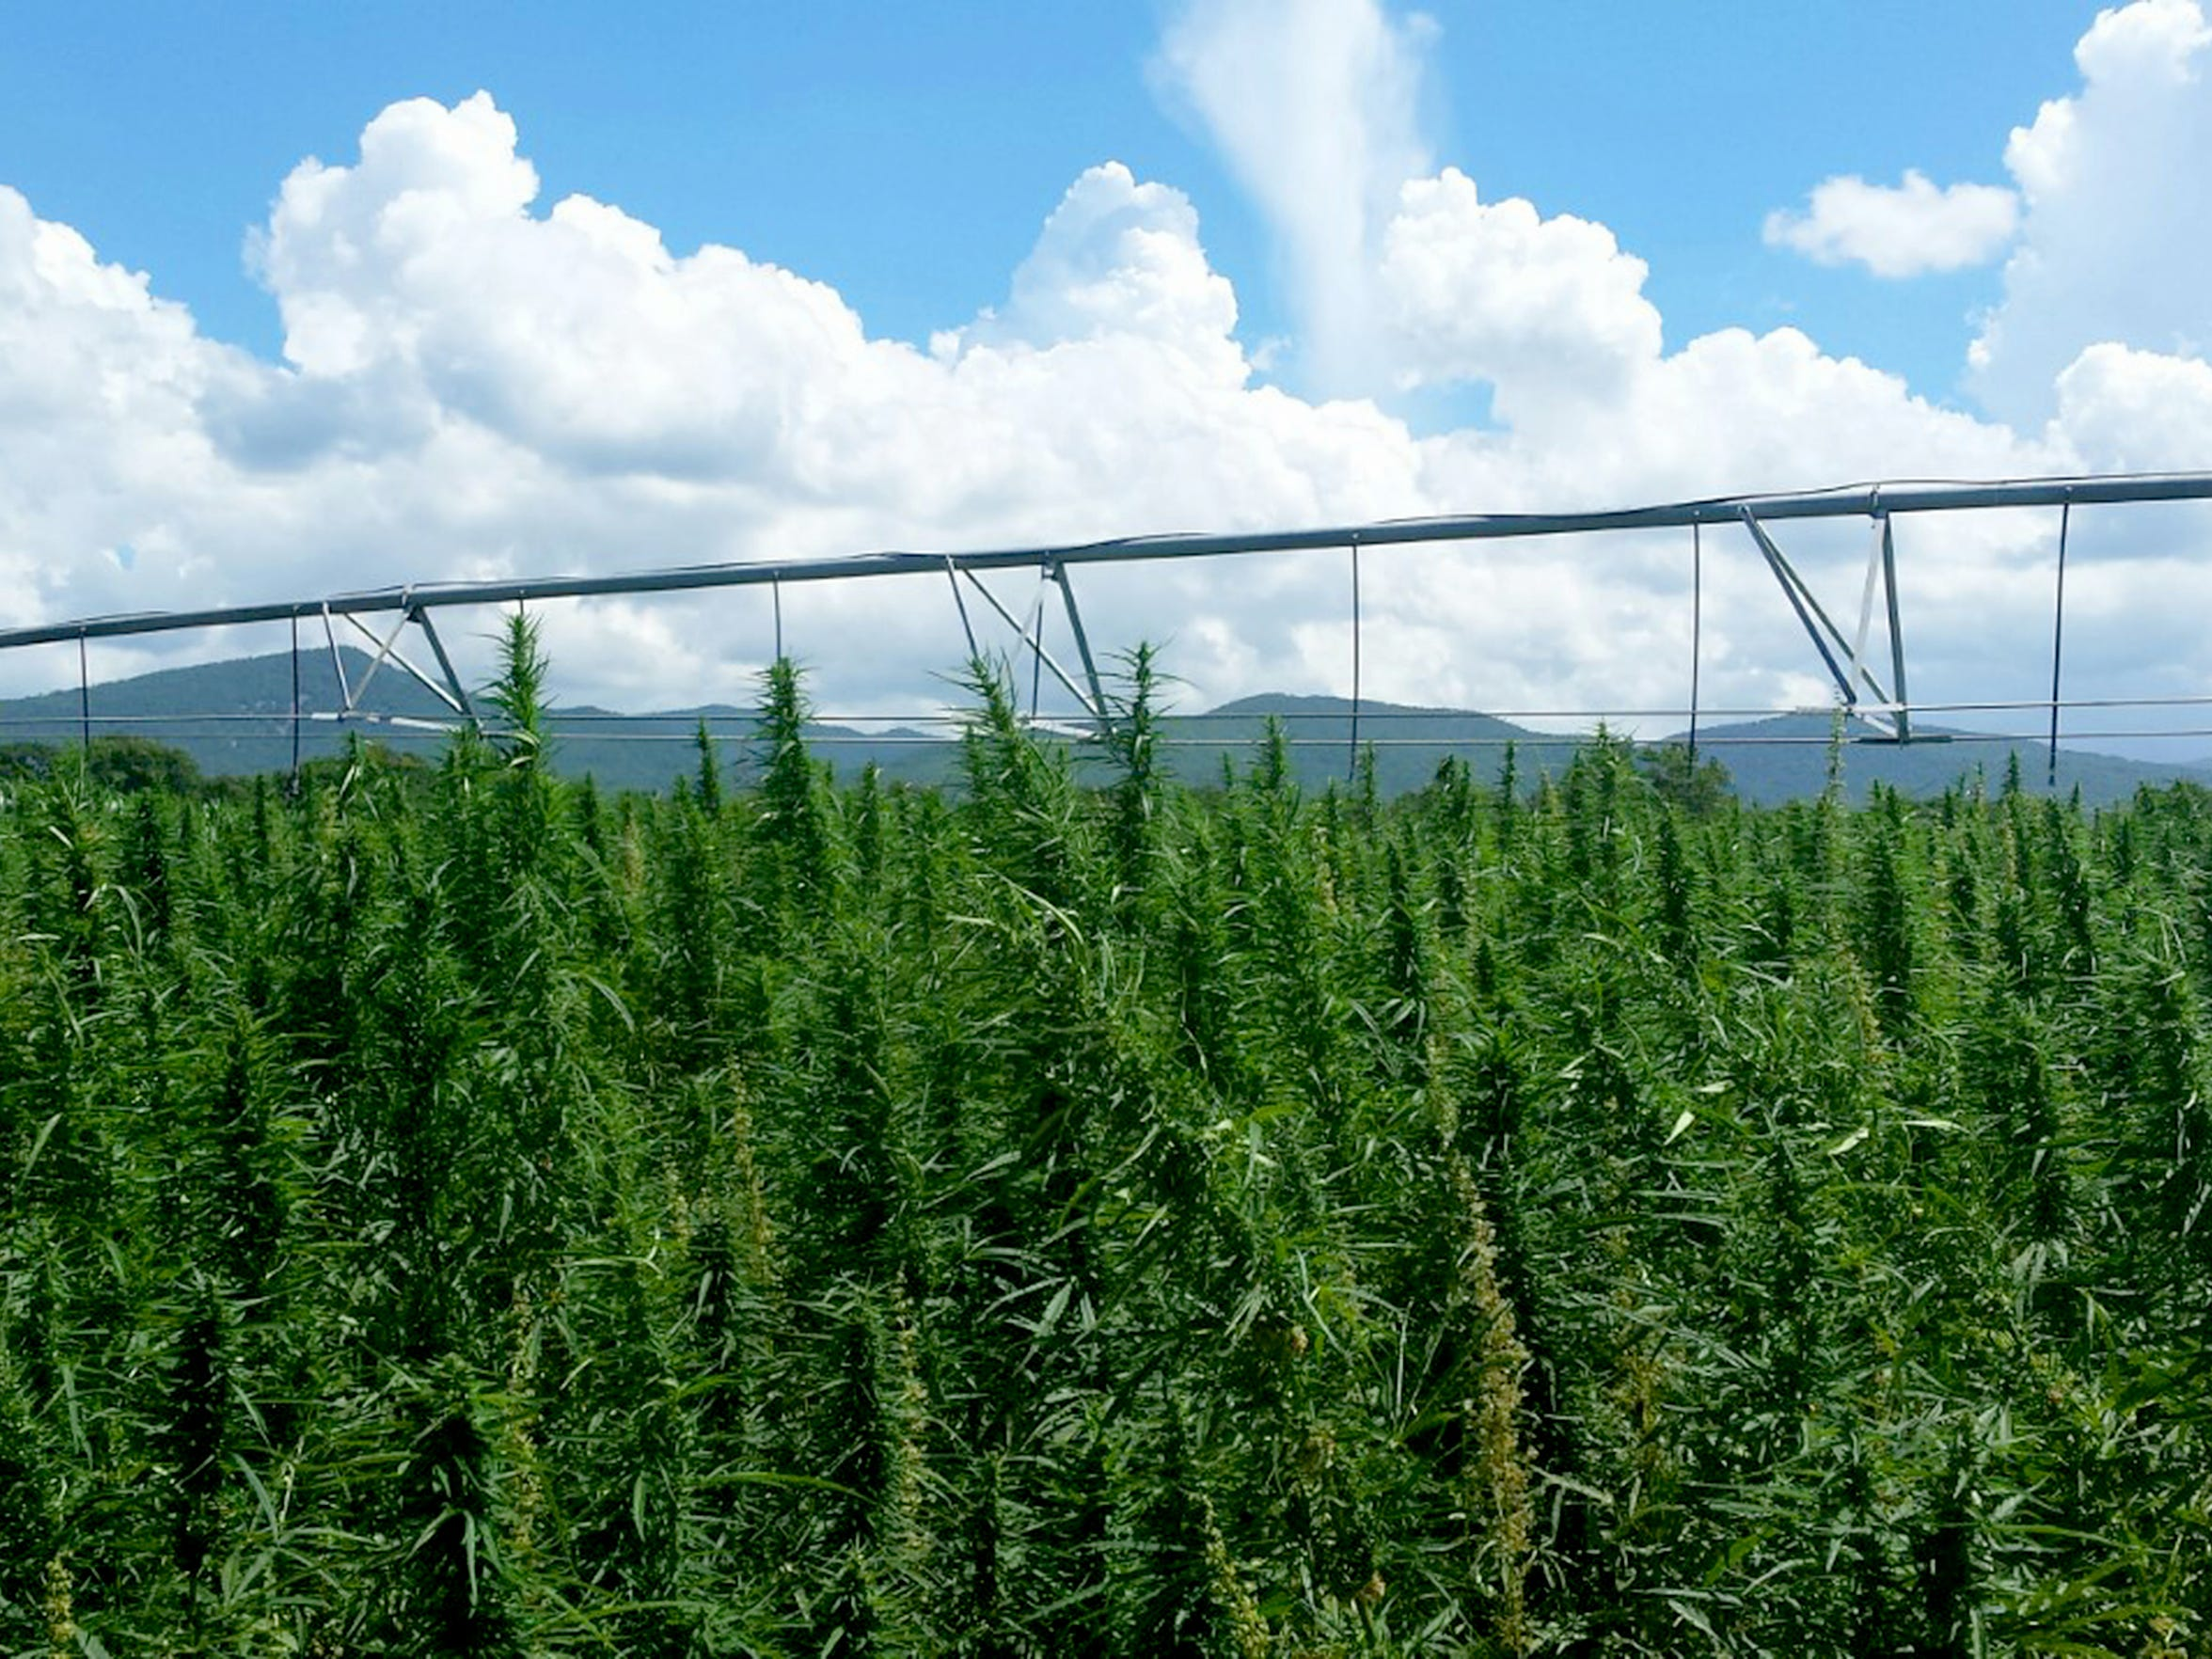 Hemp grows in a field at Riverhill Farm in Port Republic